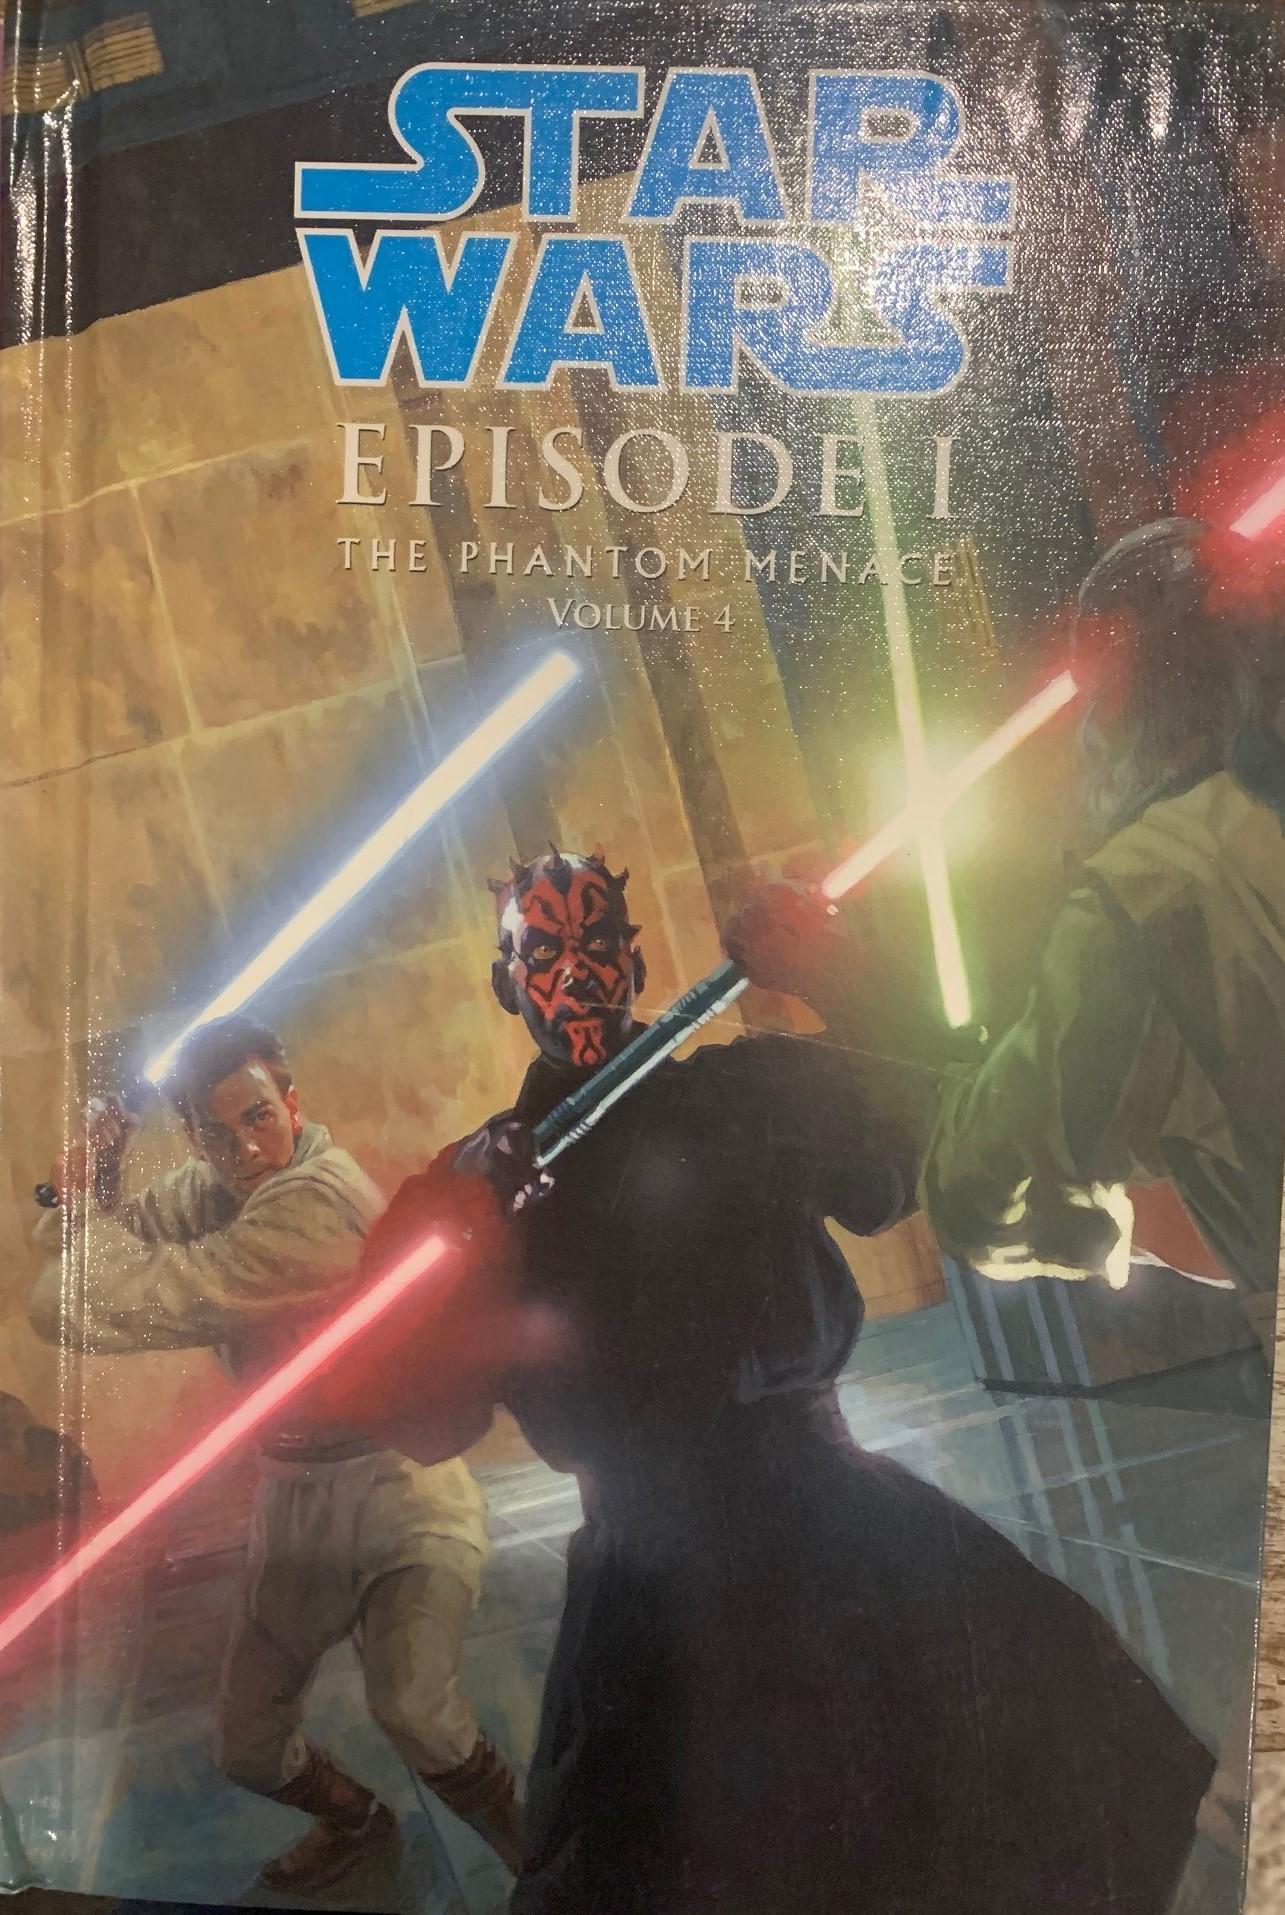 Star Wars Episode I: The Phantom Menace (Spotlight Comic Edition, Volume 4)